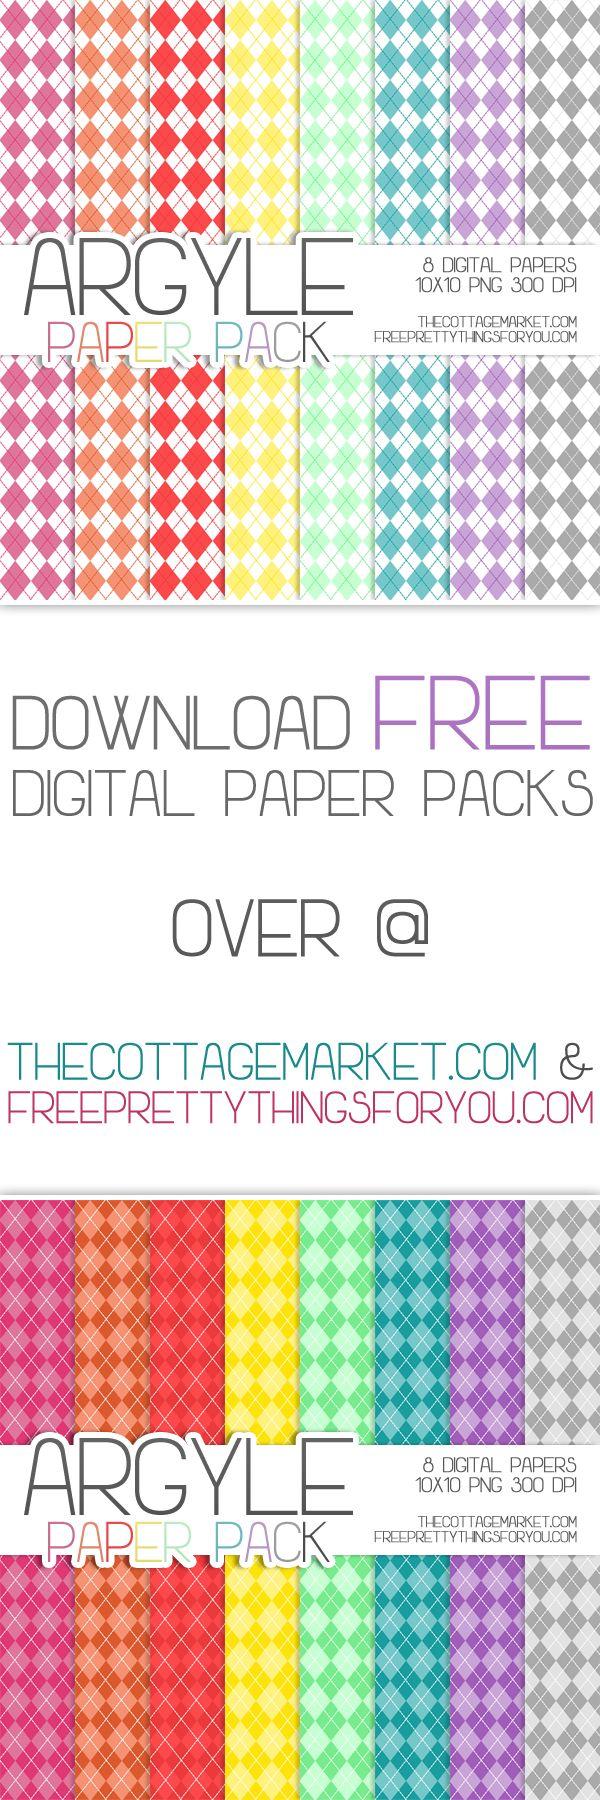 Scrapbook paper designs - Free Argyle Digital Scrapbooking Paper Pack